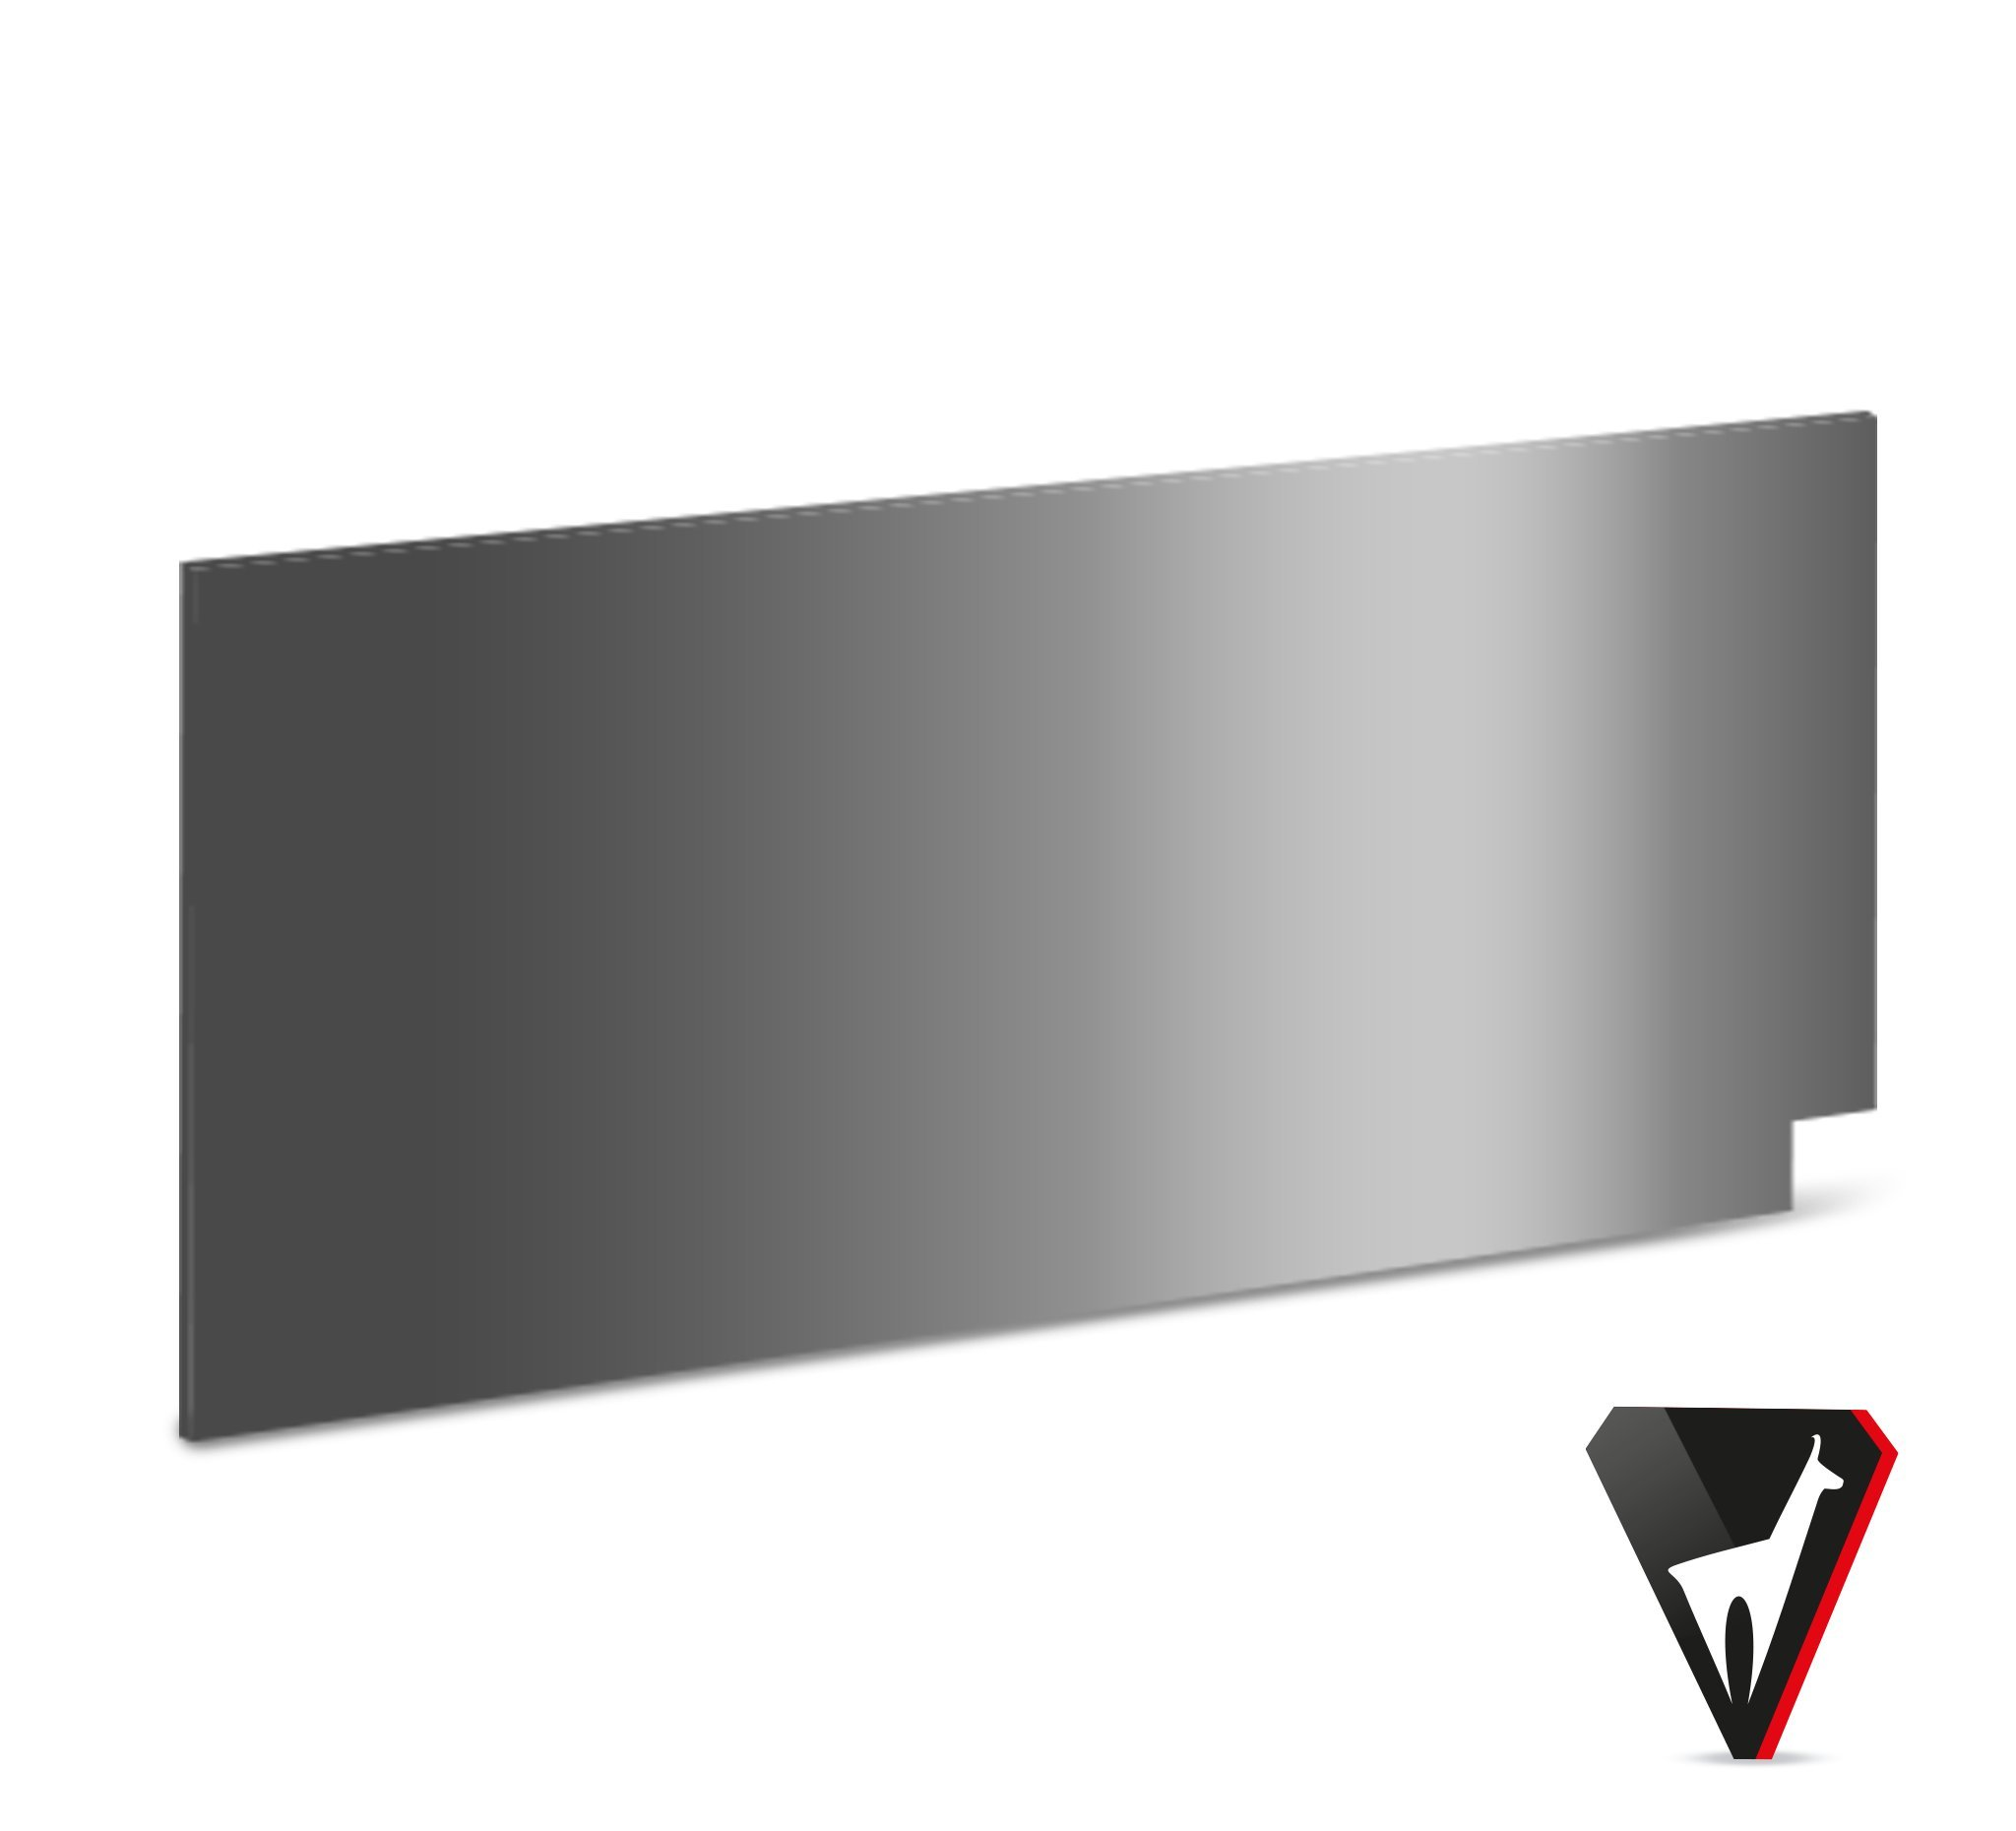 VOLA Rasqueta Metalica product image